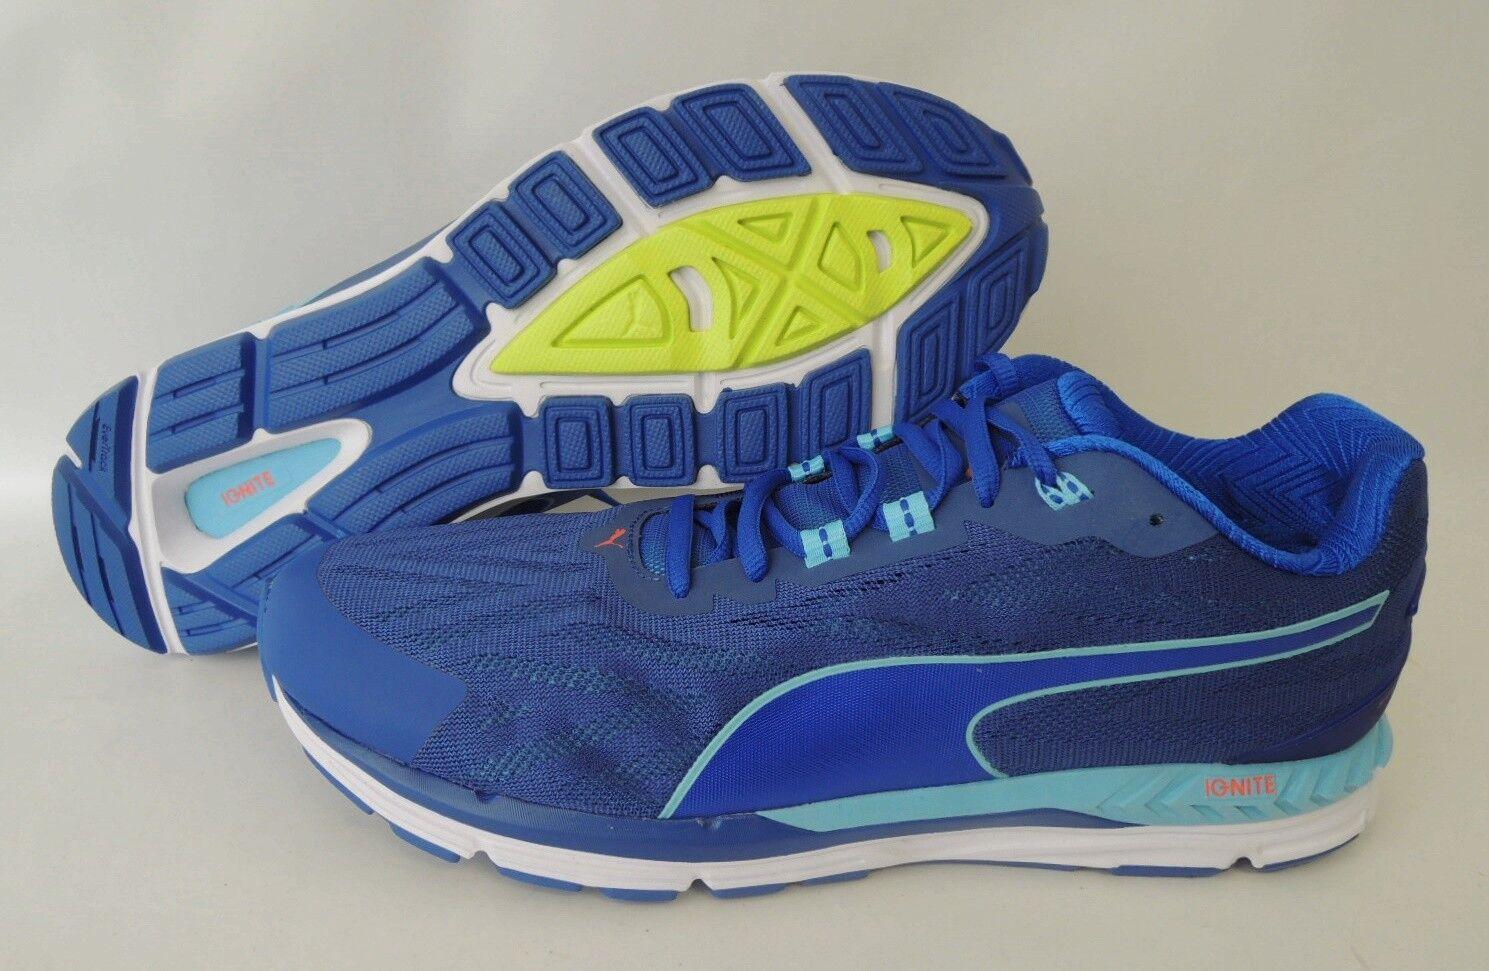 NEU Puma Speed 600 Ignite 2 Running Schuhe 44,5 Laufschuhe 188517-04 UVP139,95